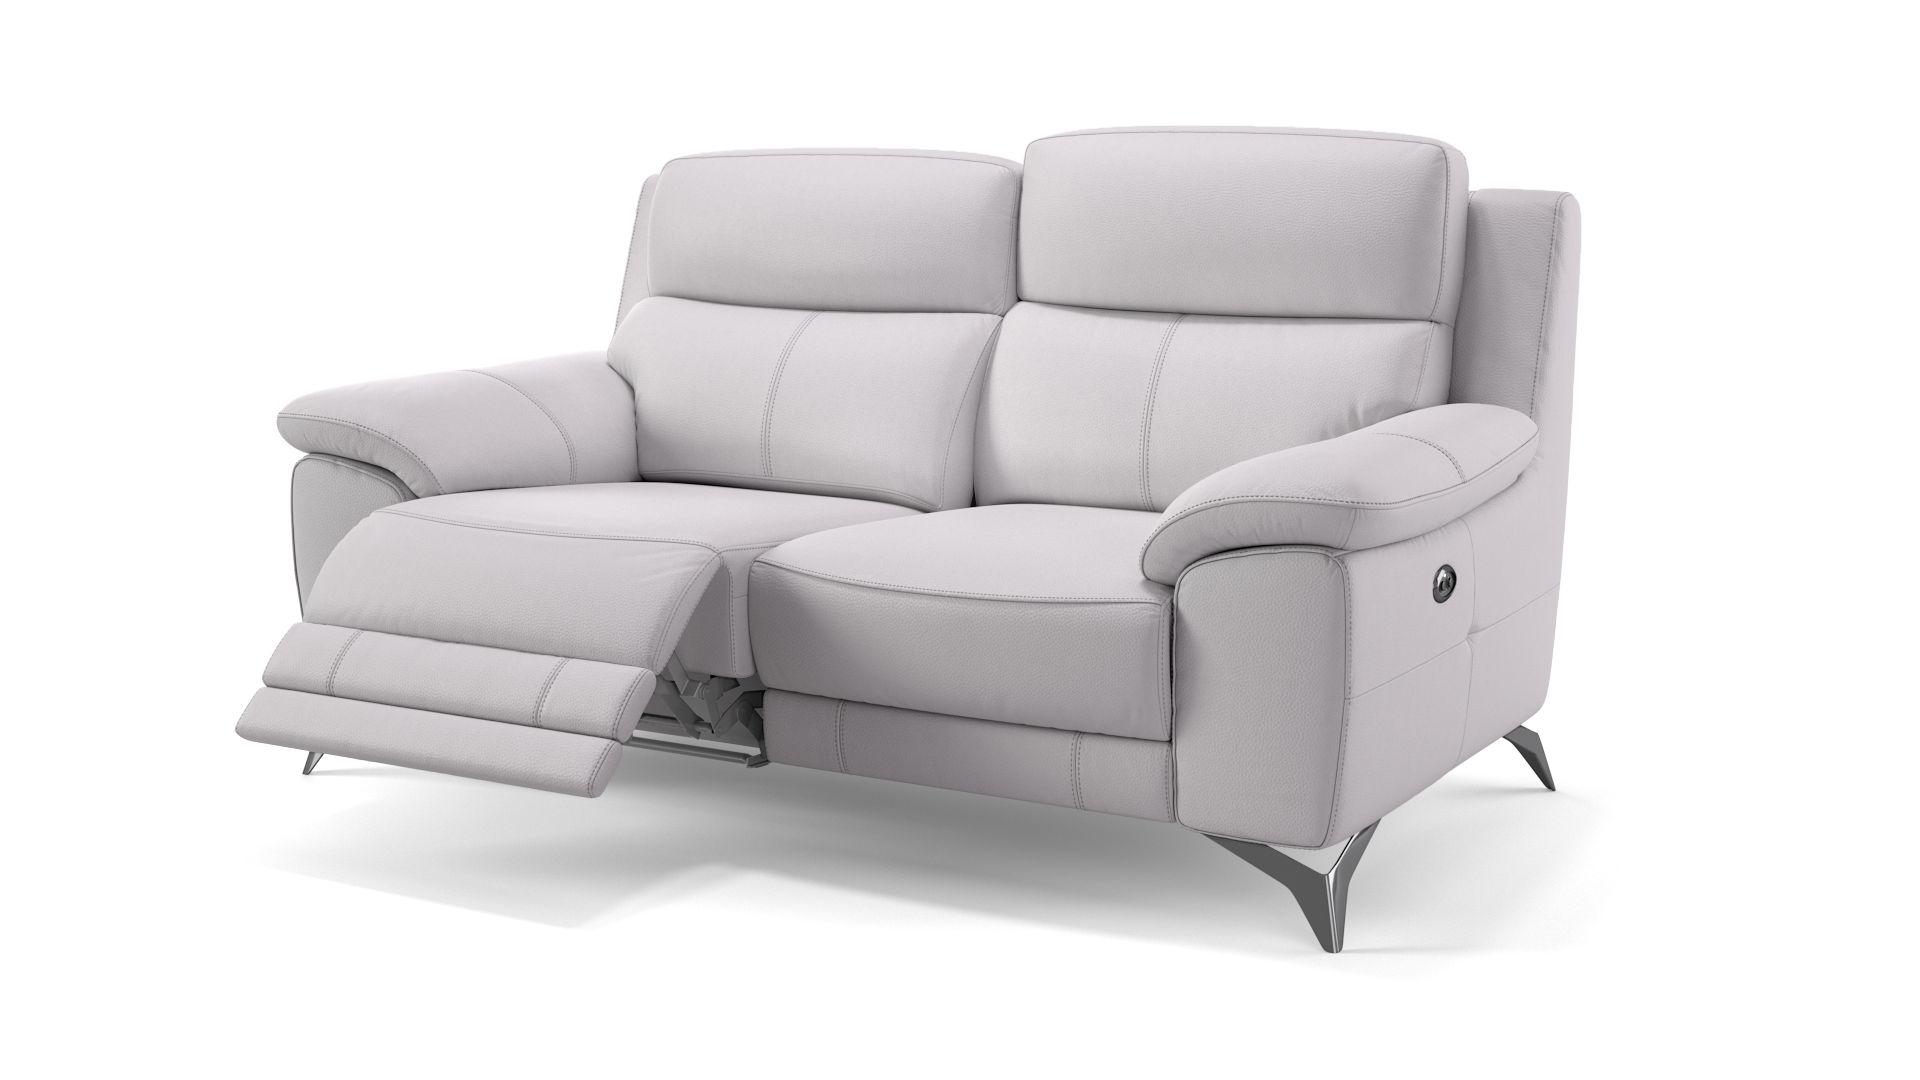 Leder 2-Sitzer Sofa LANTELLA